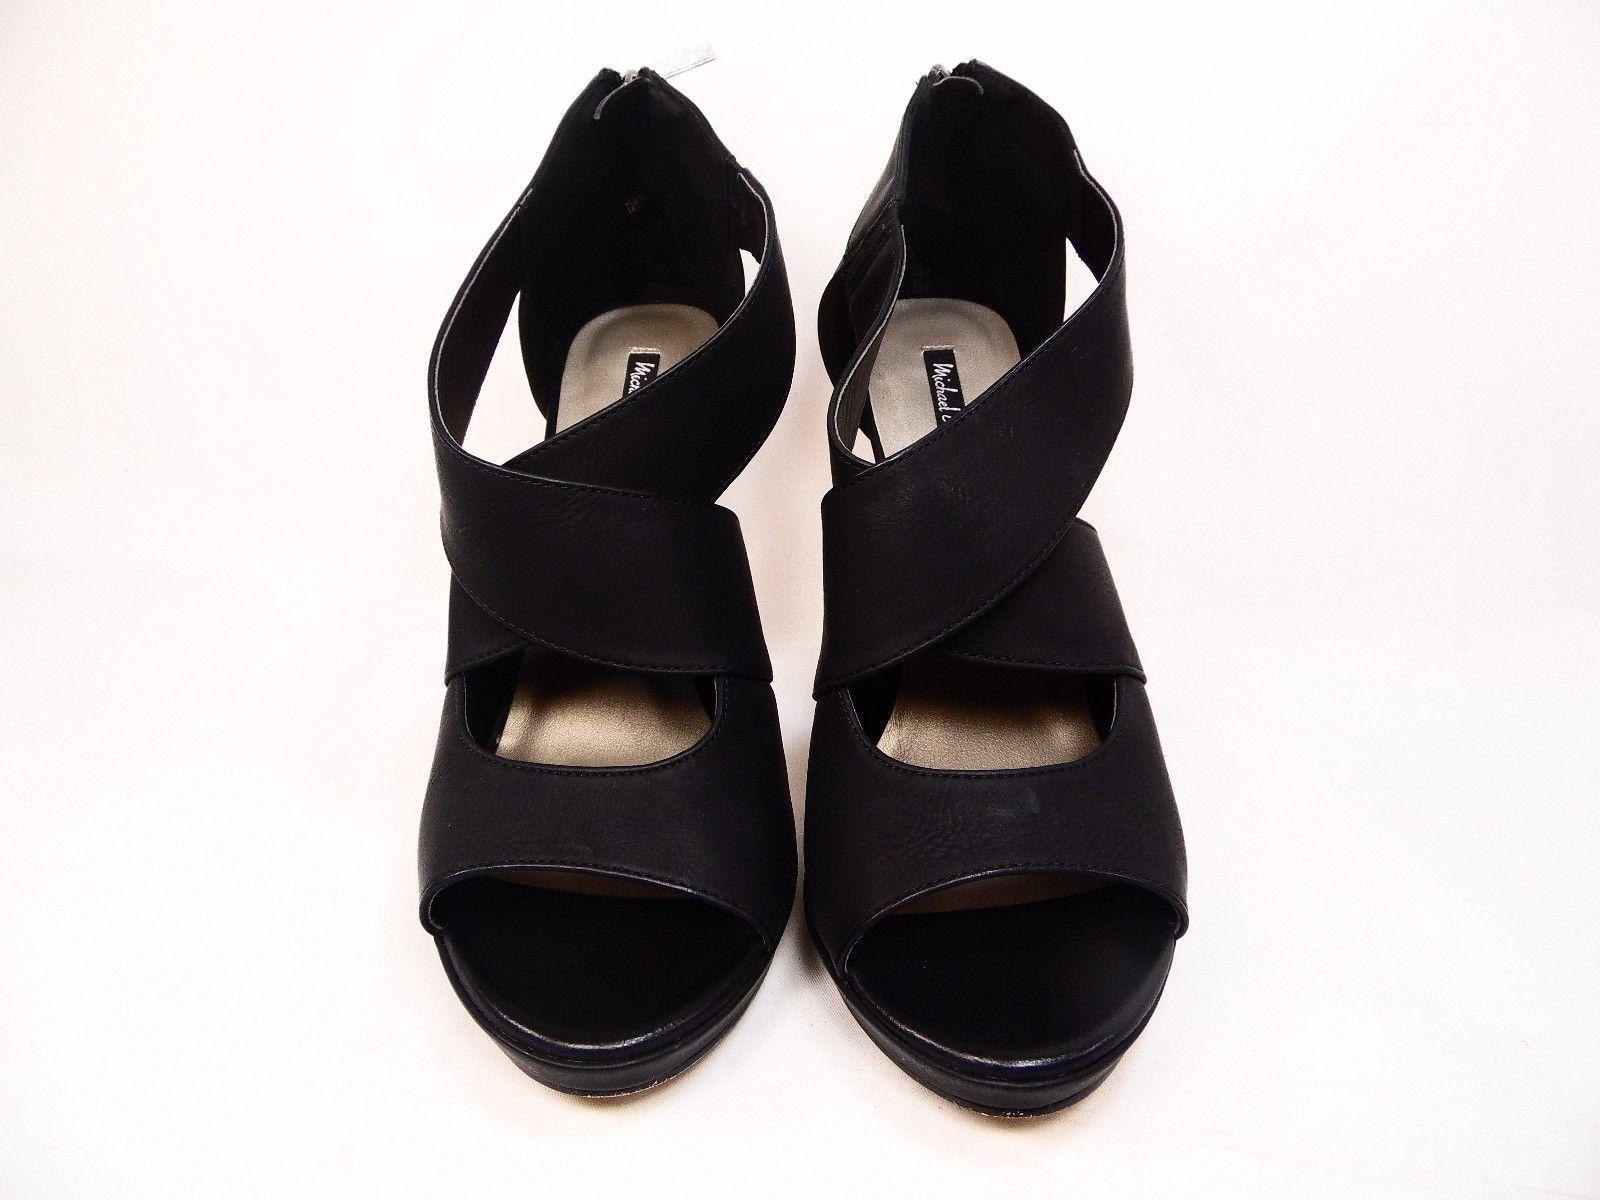 Michael Antonio Tovey Womens Sandal Black Size 9 M